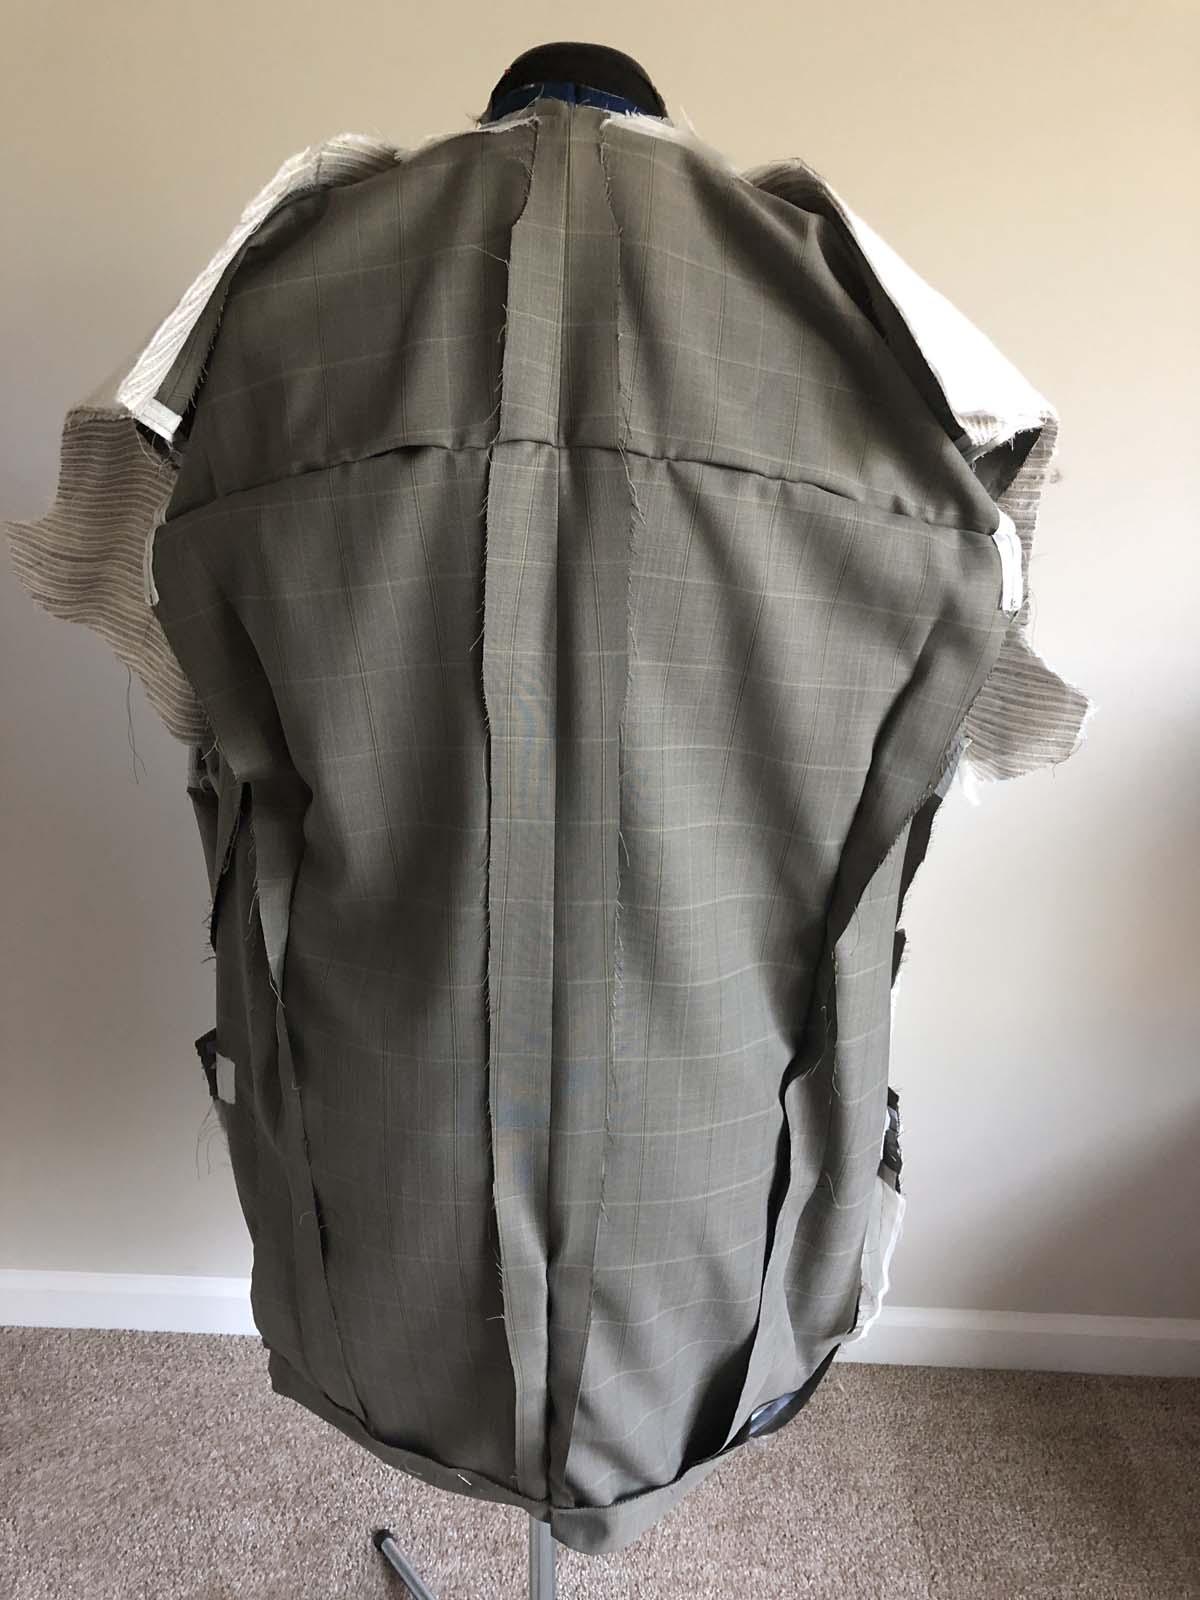 Drape-fitting the men's suit jacket body